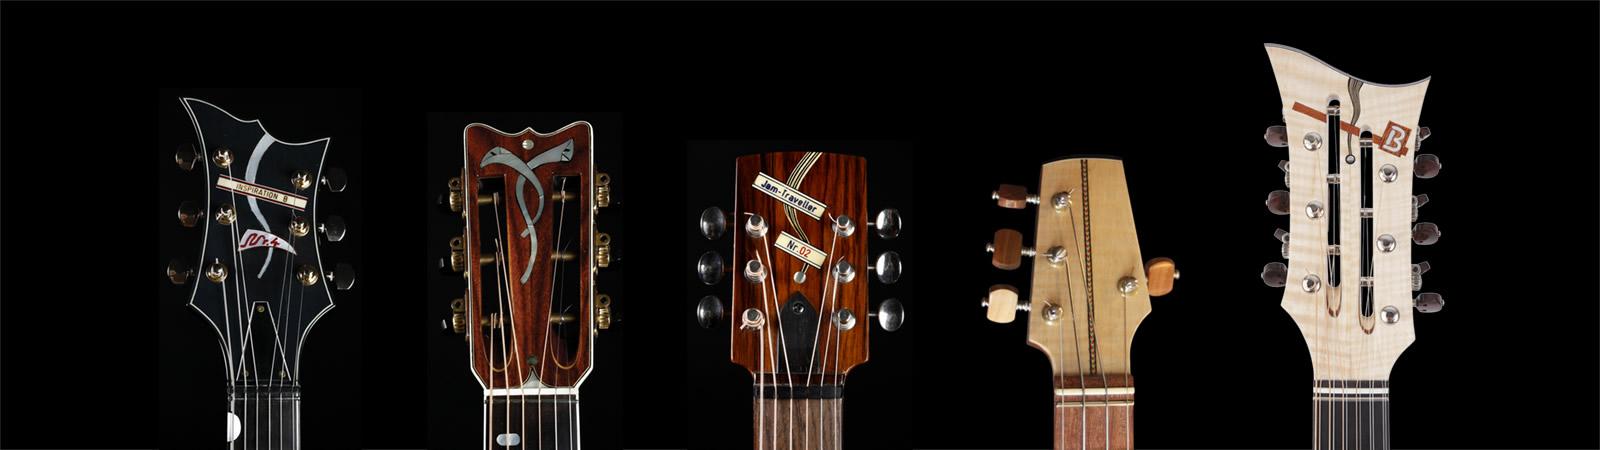 Krueger Guitars Home Page custom build banner image